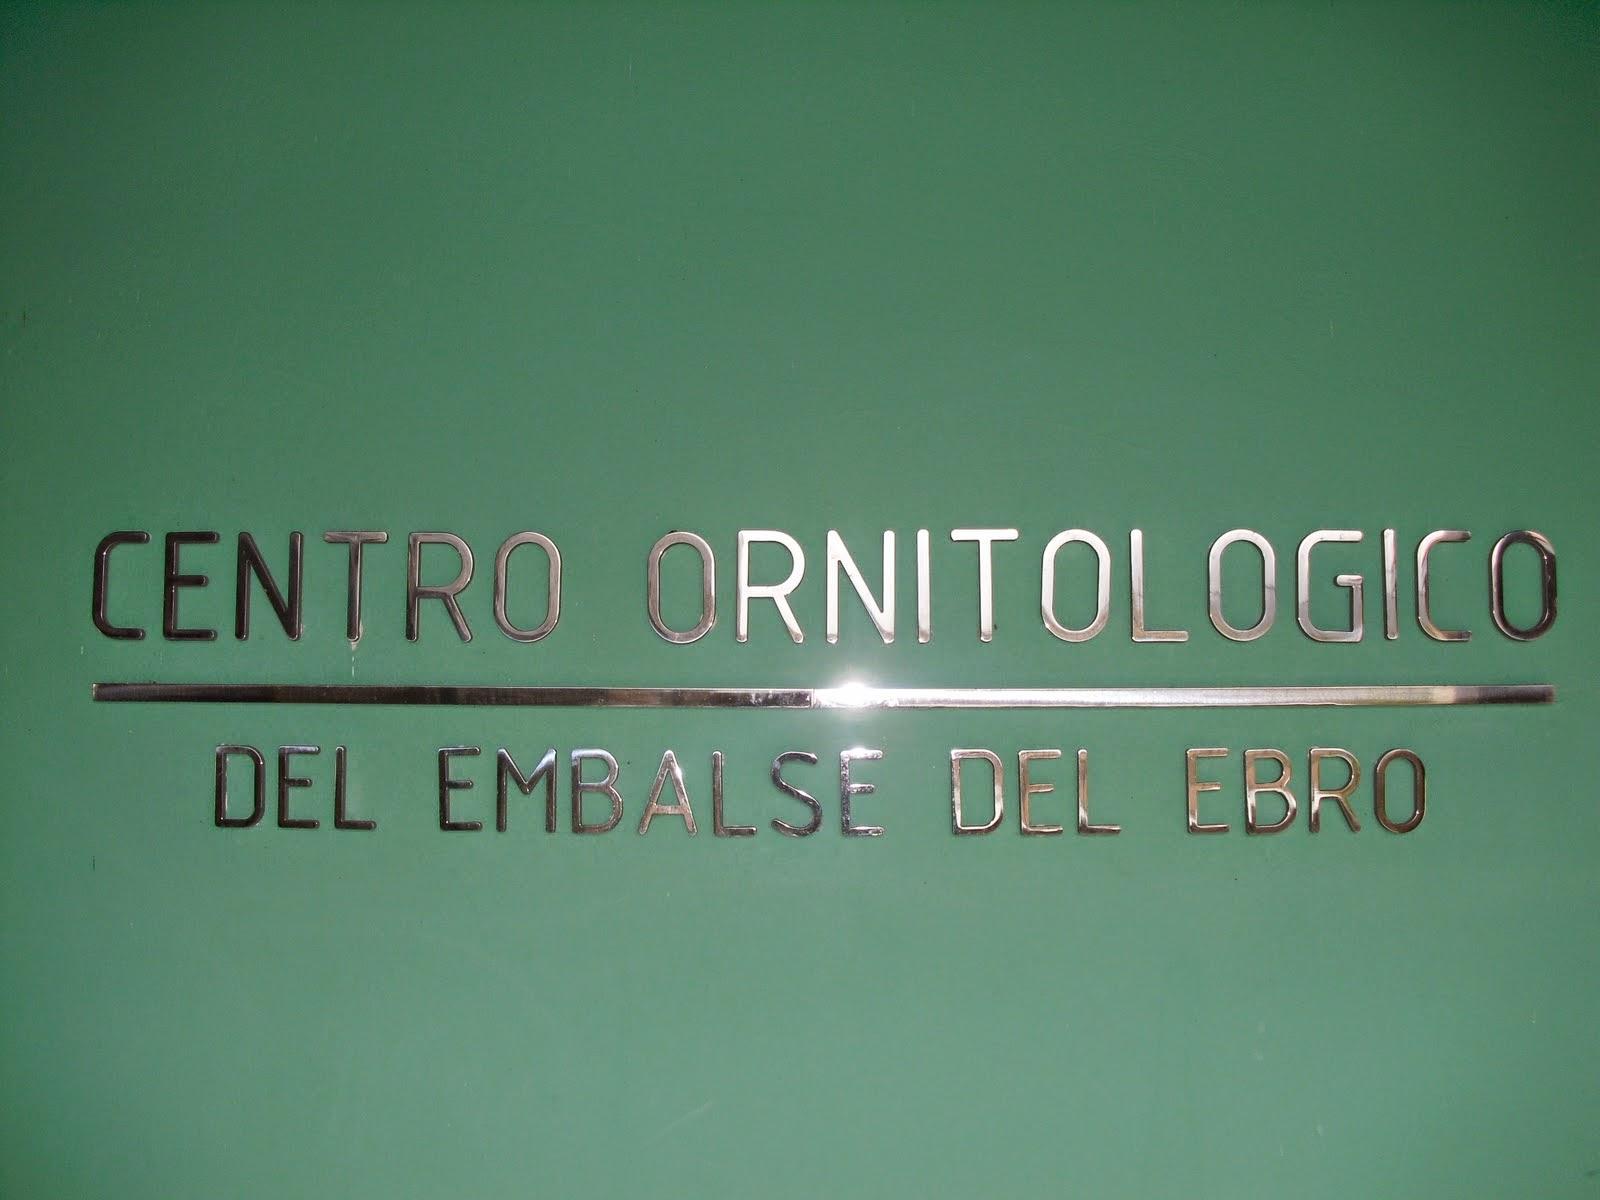 https://www.facebook.com/centroornitologico.embalsedelebro